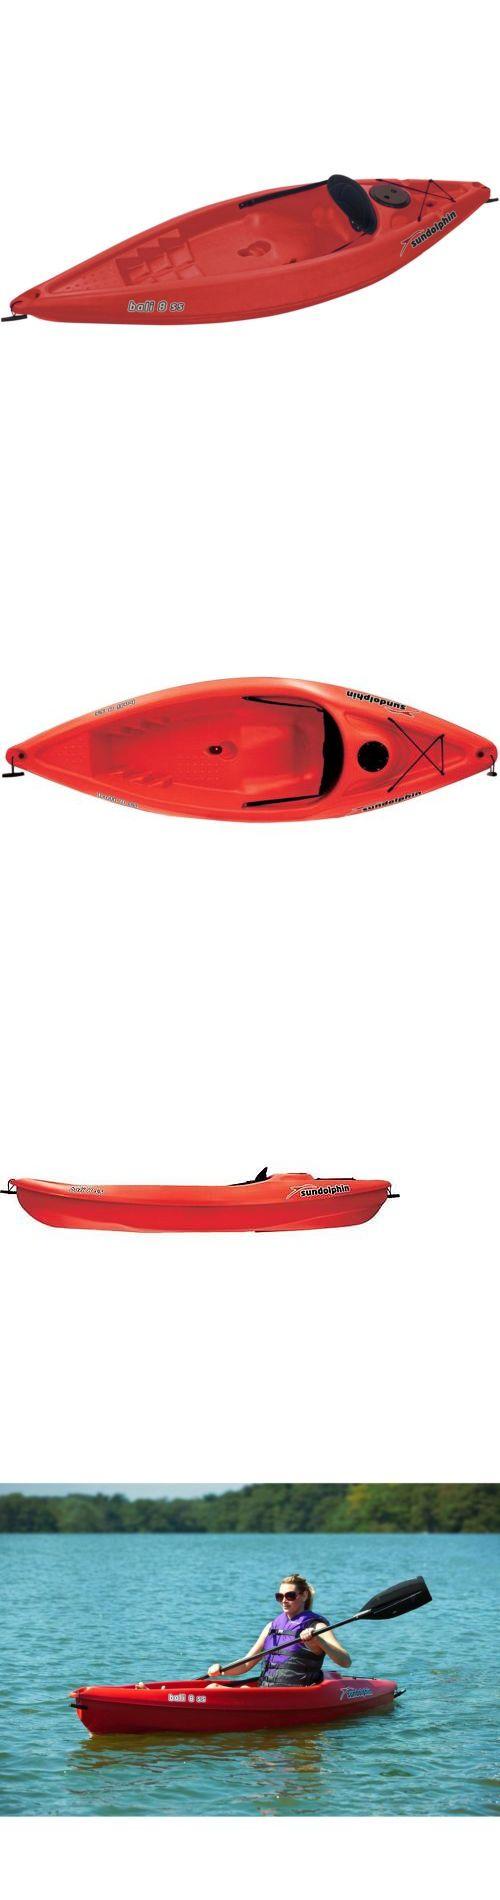 Kayaks 36122: Sun Dolphin Bali 8 Ss Sit In Kayak -> BUY IT NOW ONLY: $303.3 on eBay!